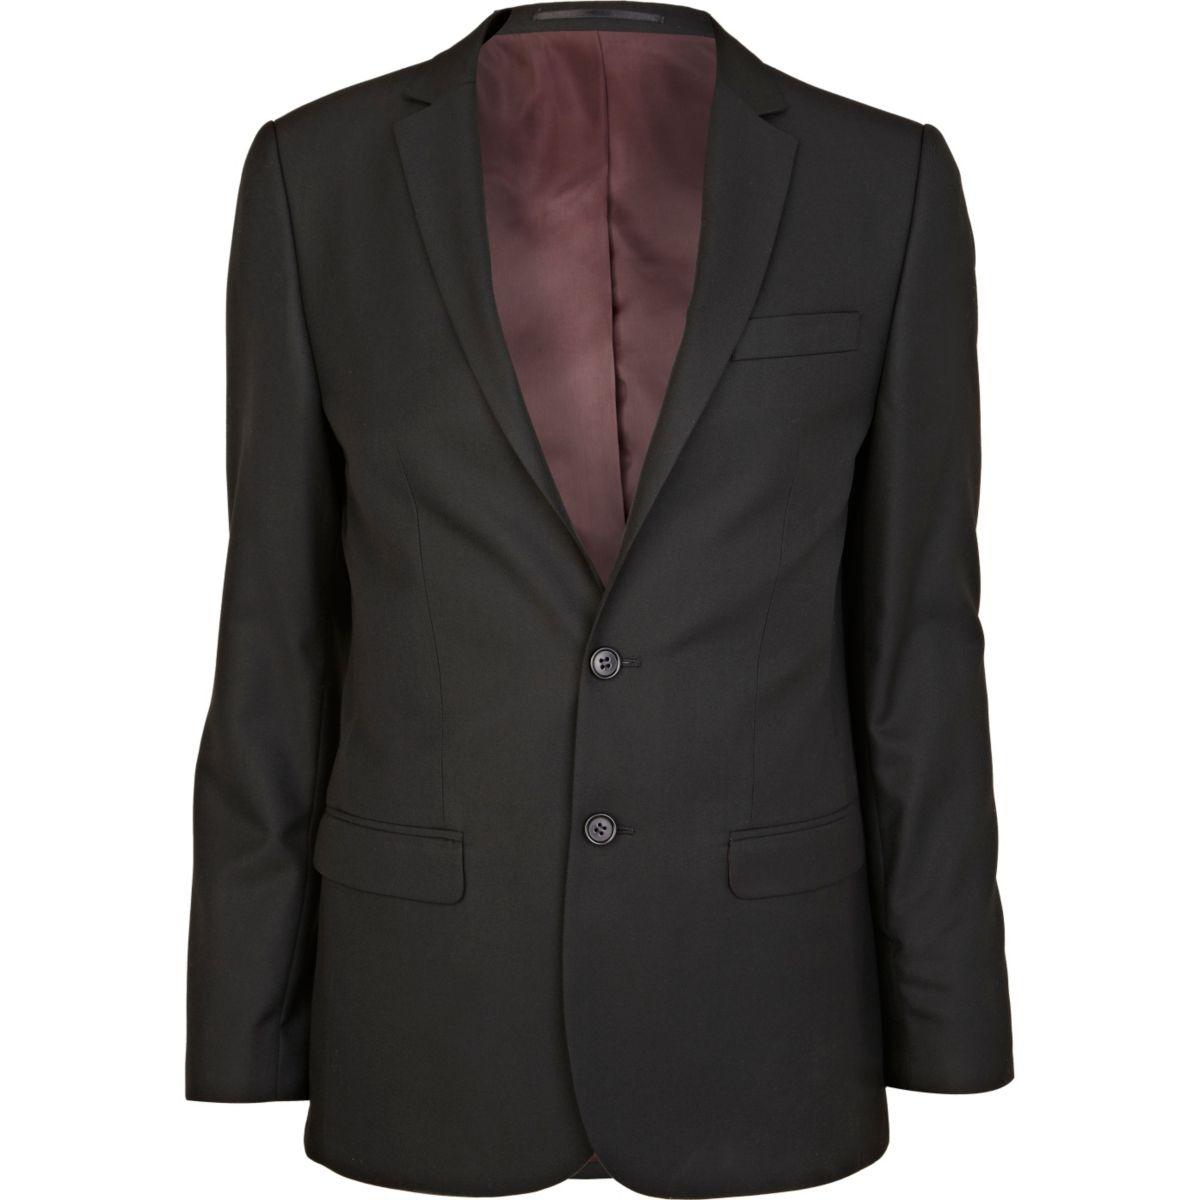 Schwarze elegante Anzugjacke